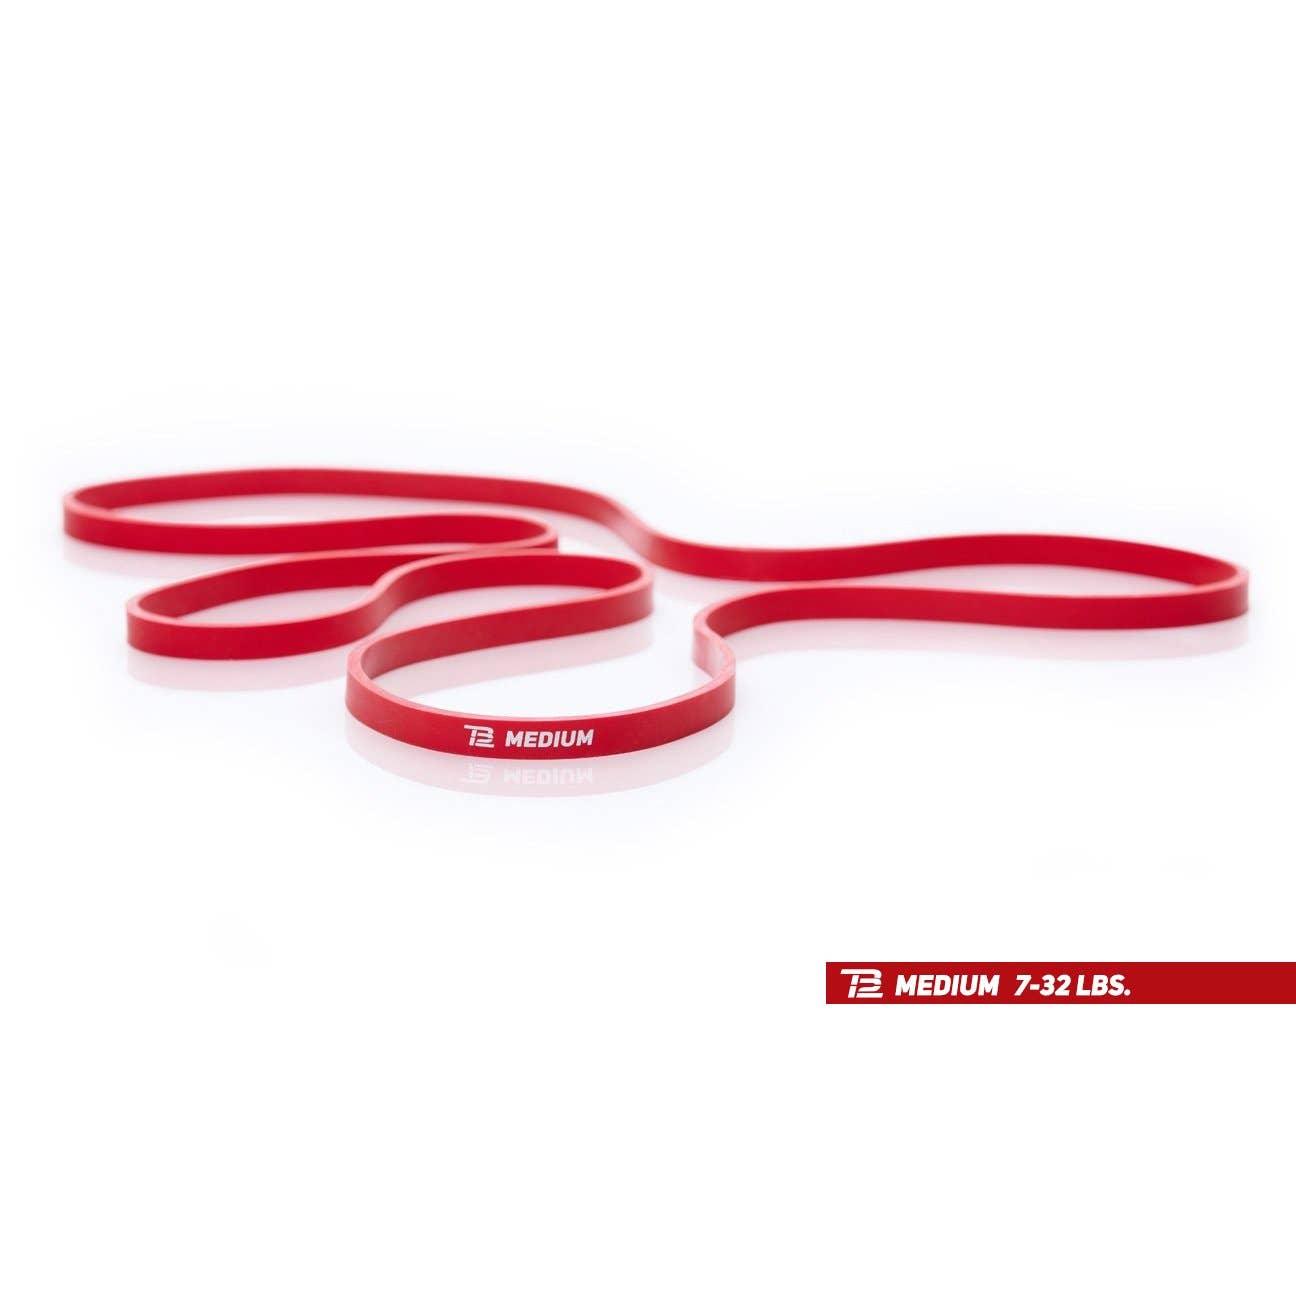 tb12 long medium looped resistance band